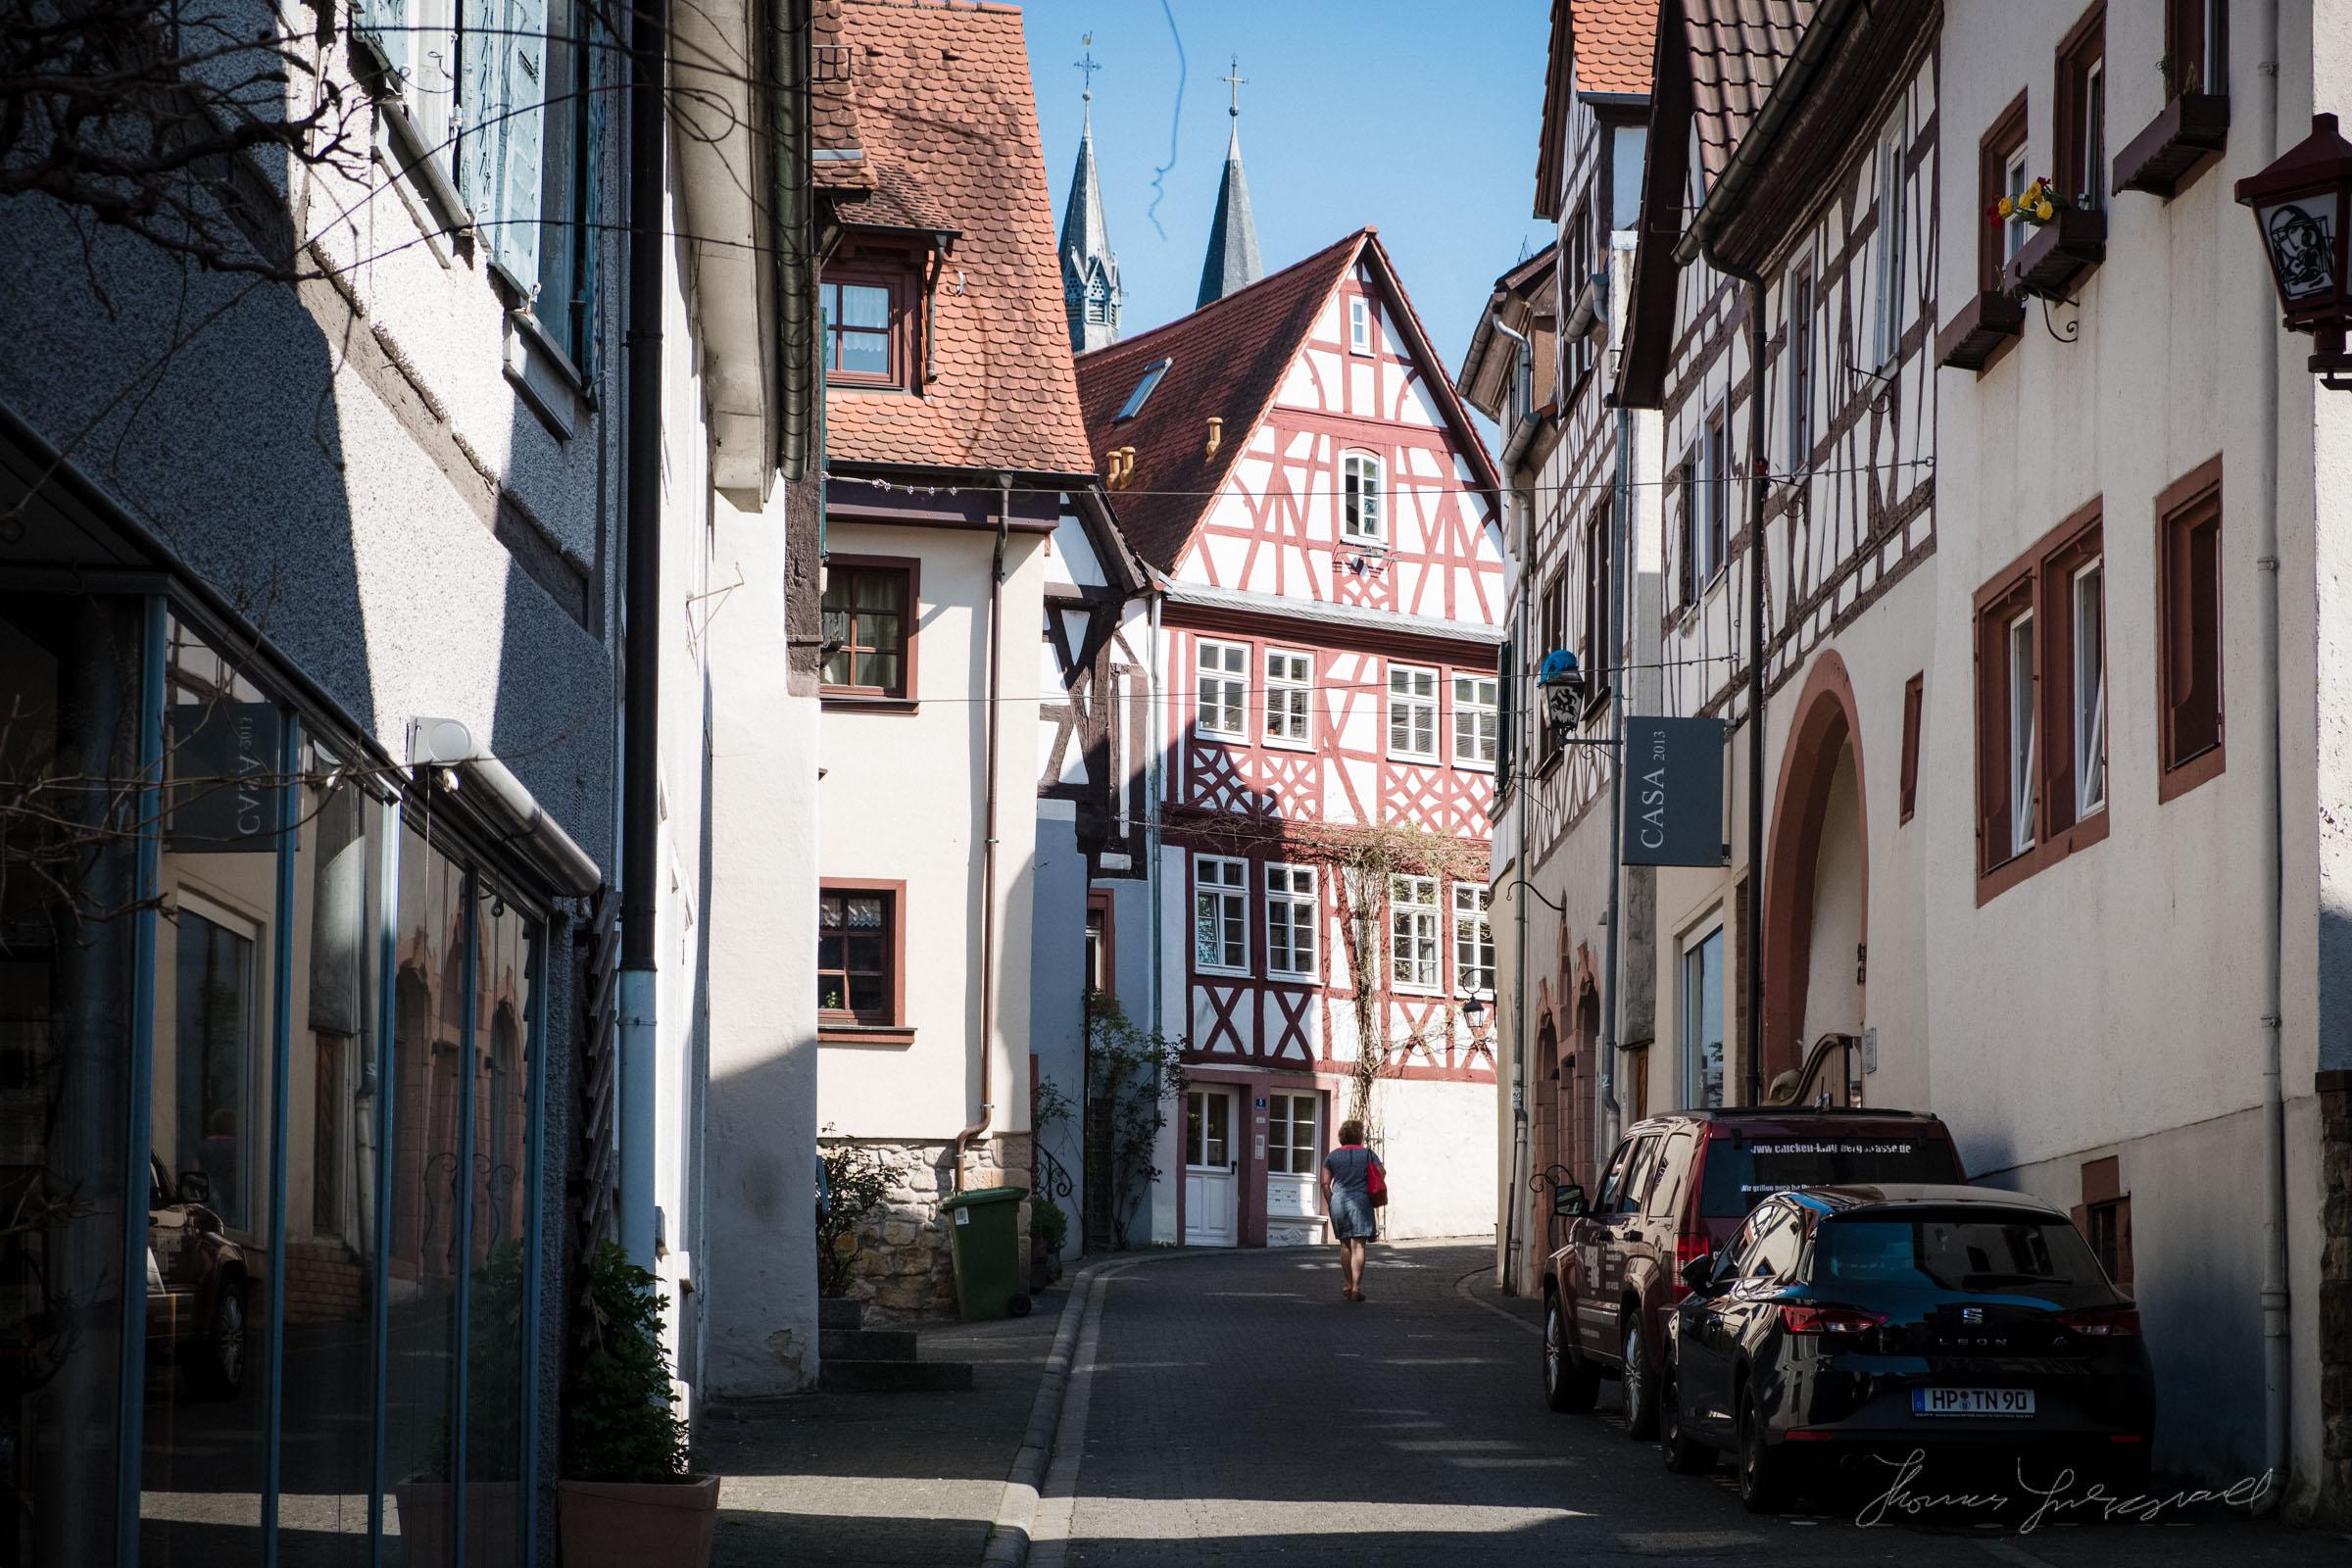 Heppenheim Old TownMedieval Streets in Heppenheim, Germany